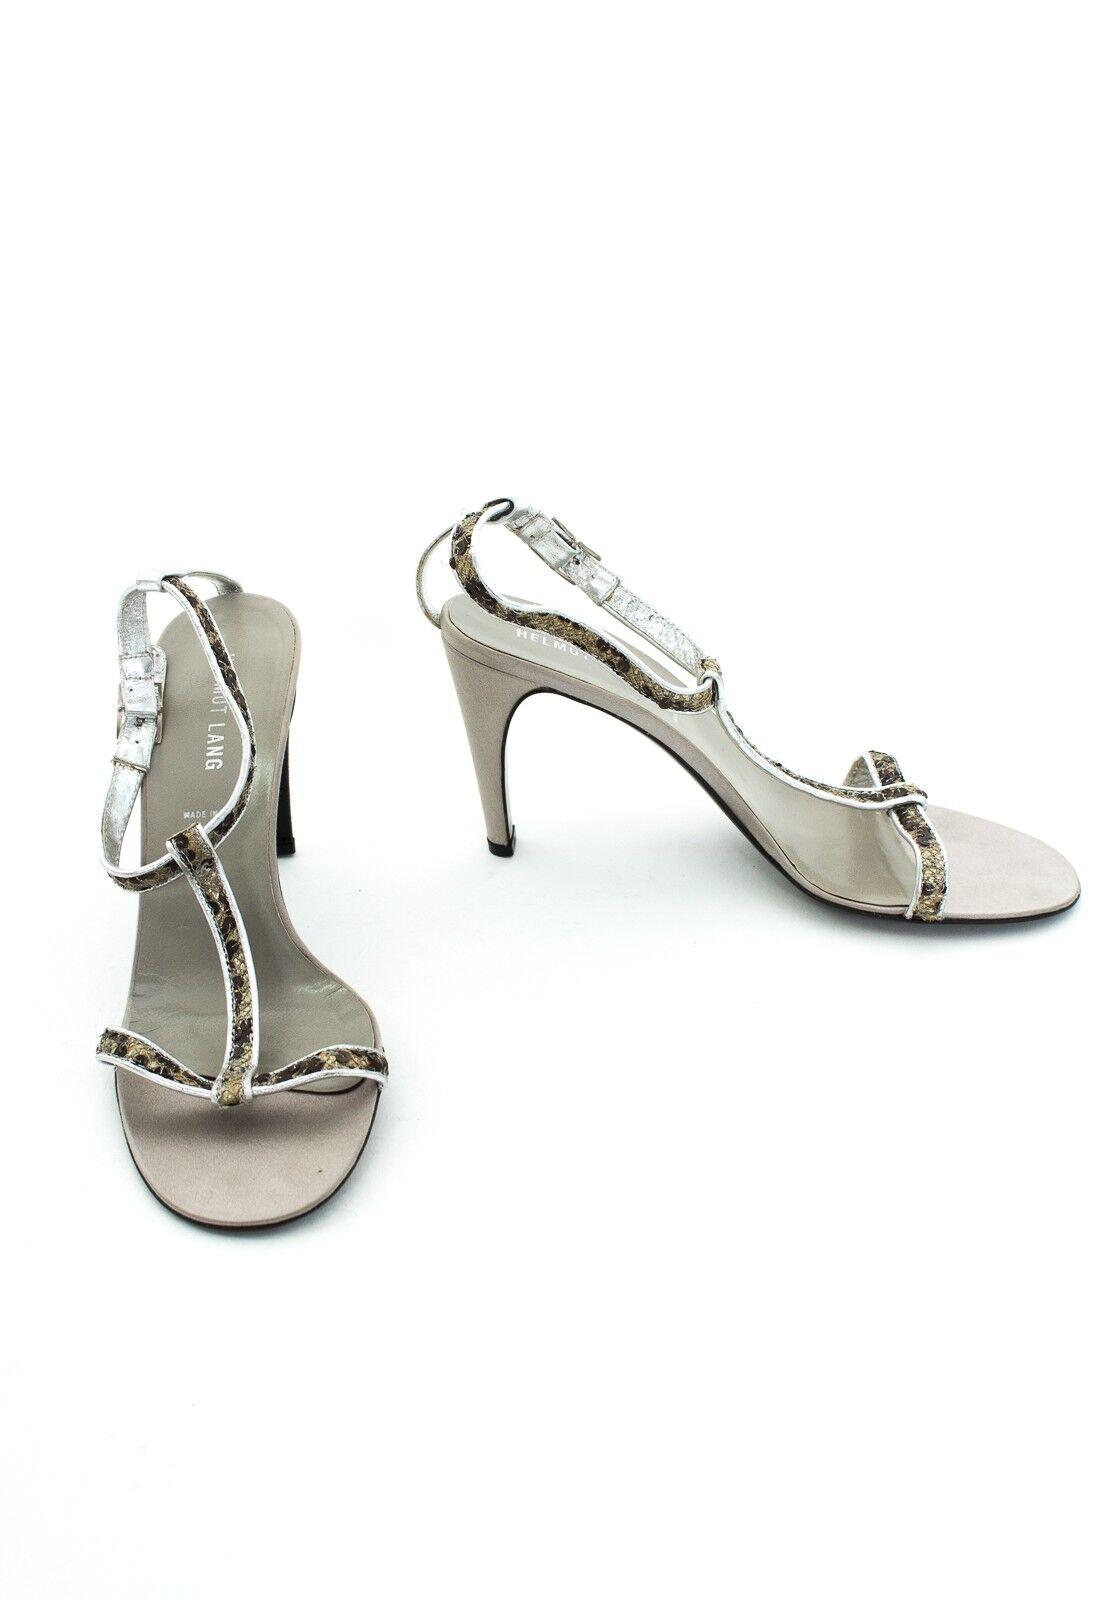 Helmut lang SEÑORA zapatos sandalias talla UE 40,5